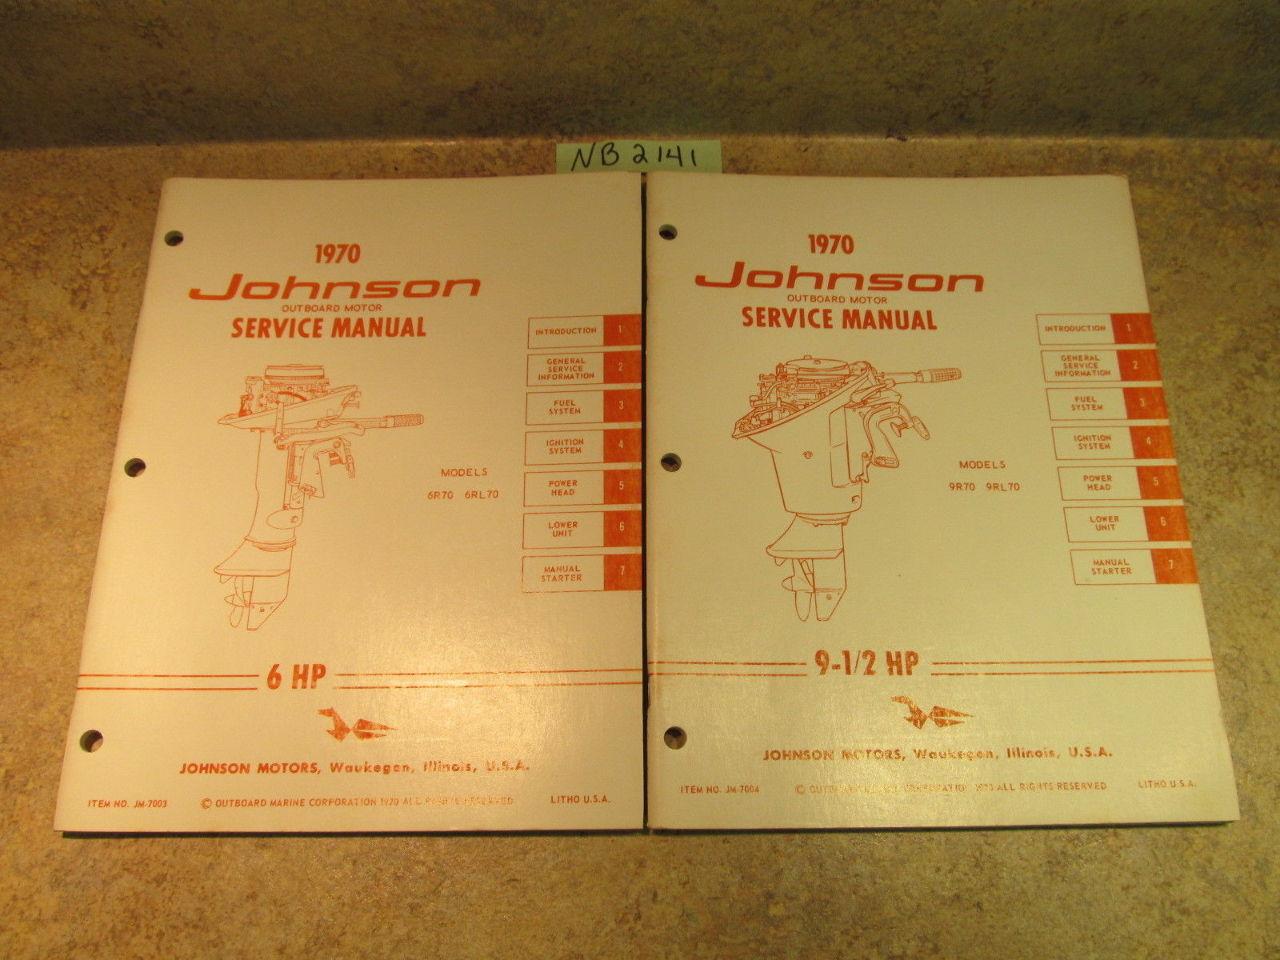 ... 1970 Johnson Evinrude Outboard Service Manual Year Set 1.5- 115 HP ...